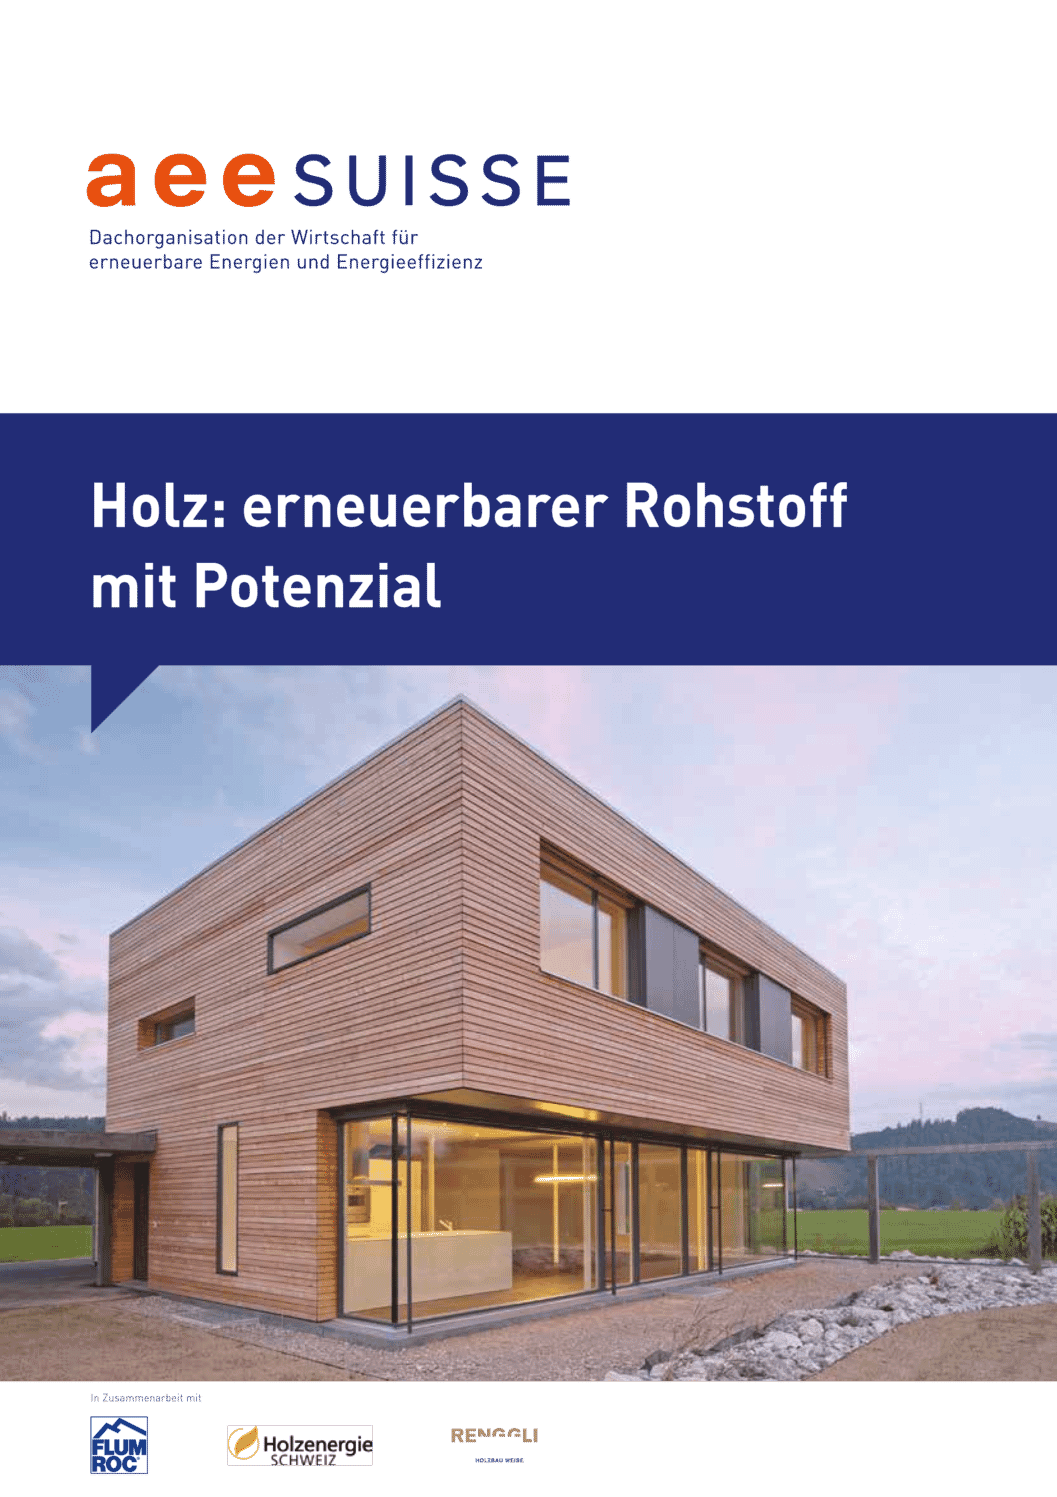 aee suisse Wald Holz Erneuerbarer Rohstoff